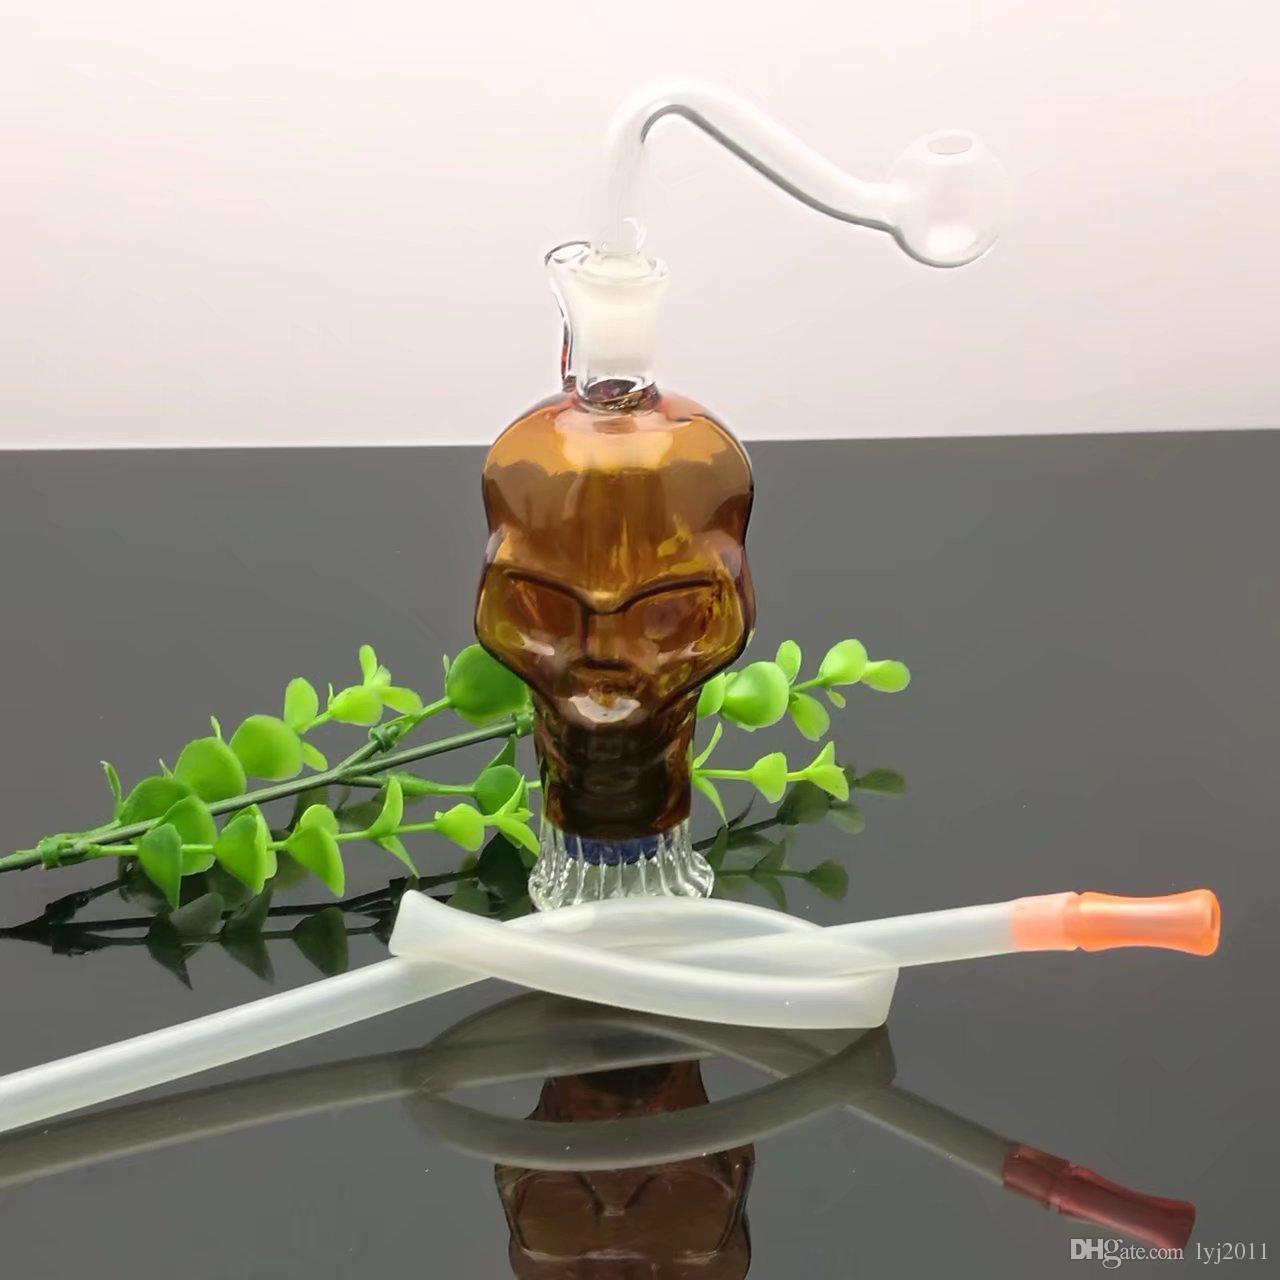 Mini farbigen Knochen Glastopf Großhandel Glas Bongs Ölbrenner Glas Wasserpfeife Öl Rigs Rauchen Rigs